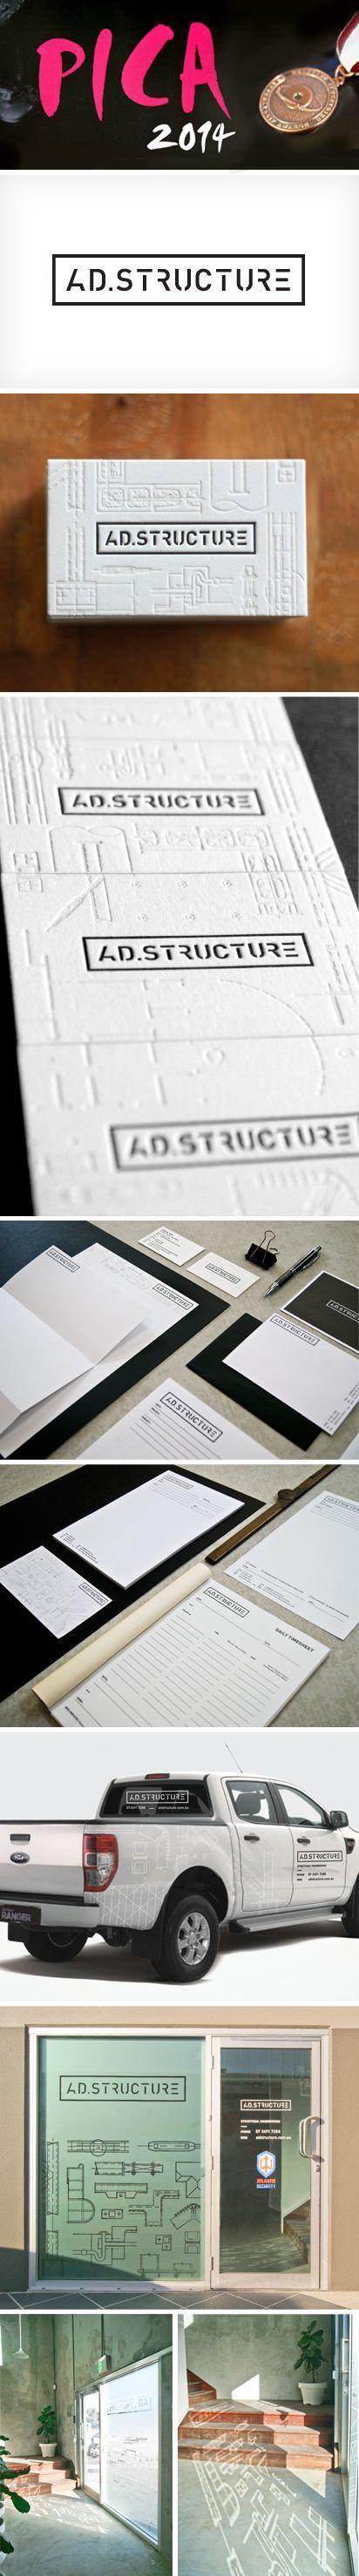 PICA Award Winning Letterpress Business Cards And Brand Identity Designed  Andu2026